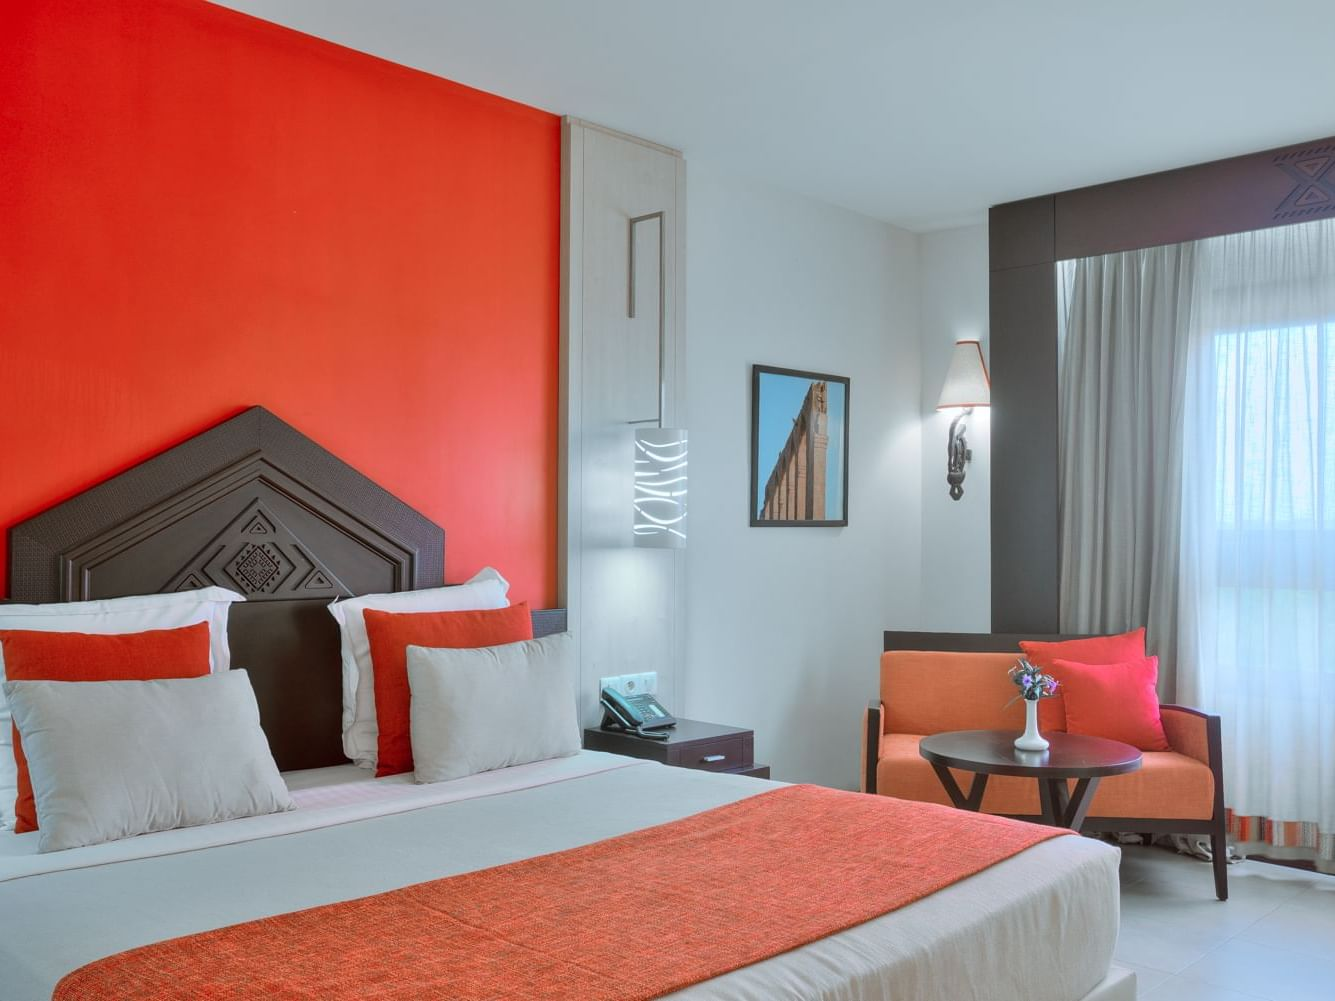 Standard room in Azalai hotel